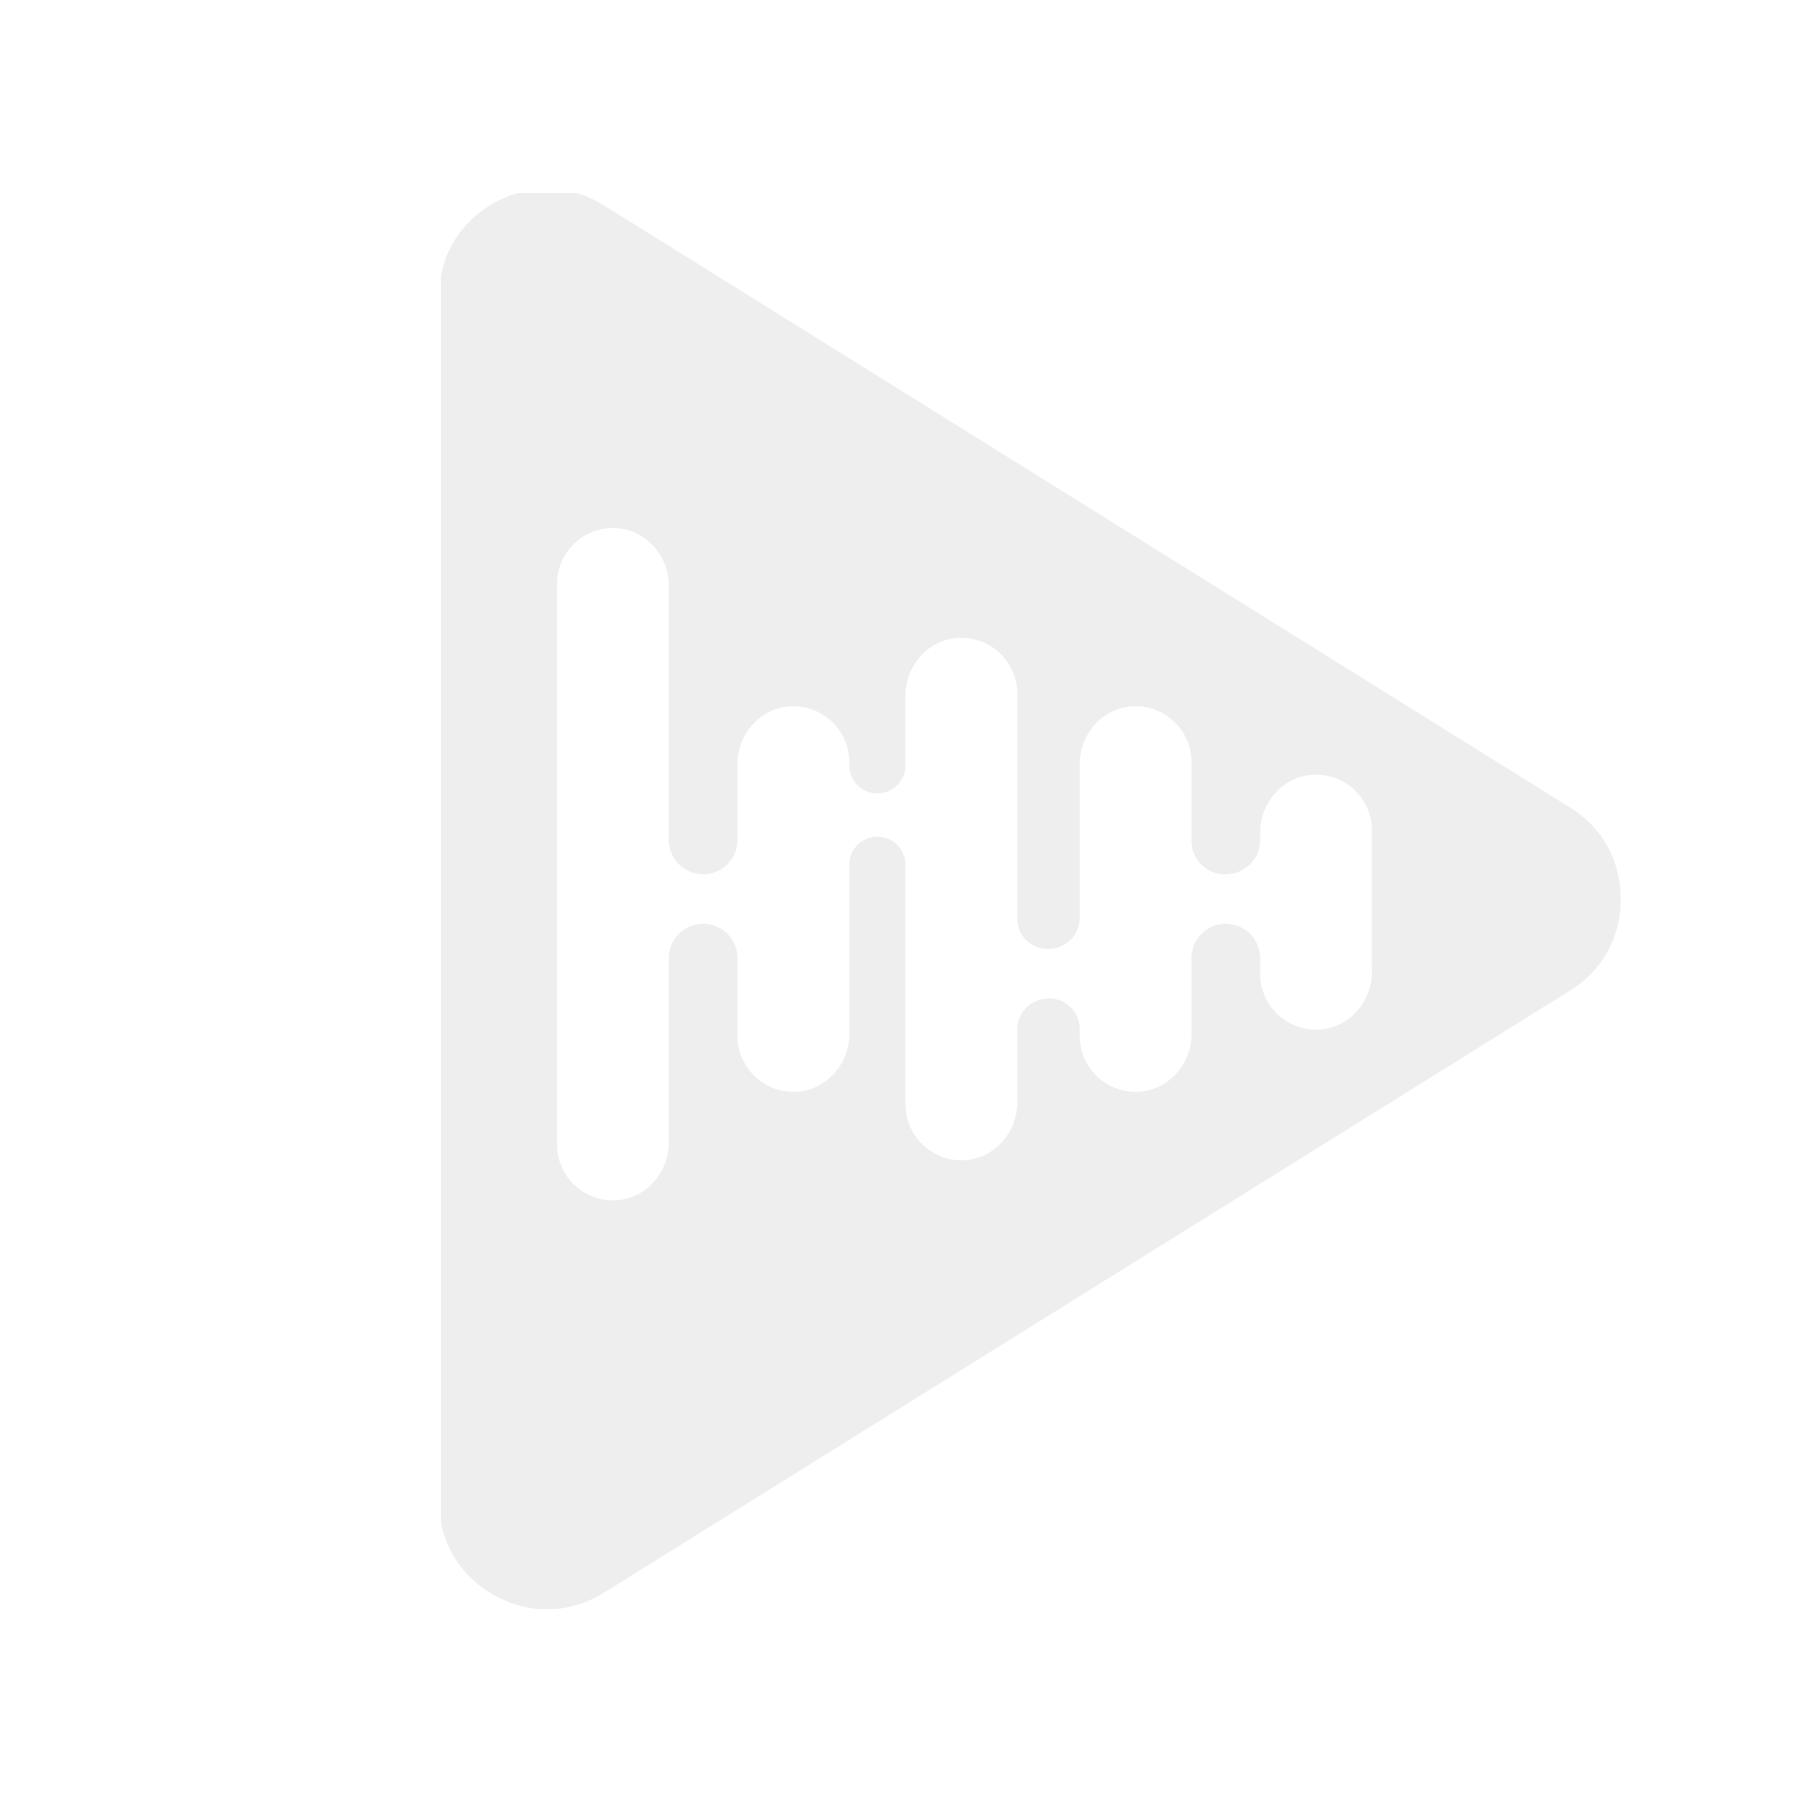 Speedsignal C-3414105